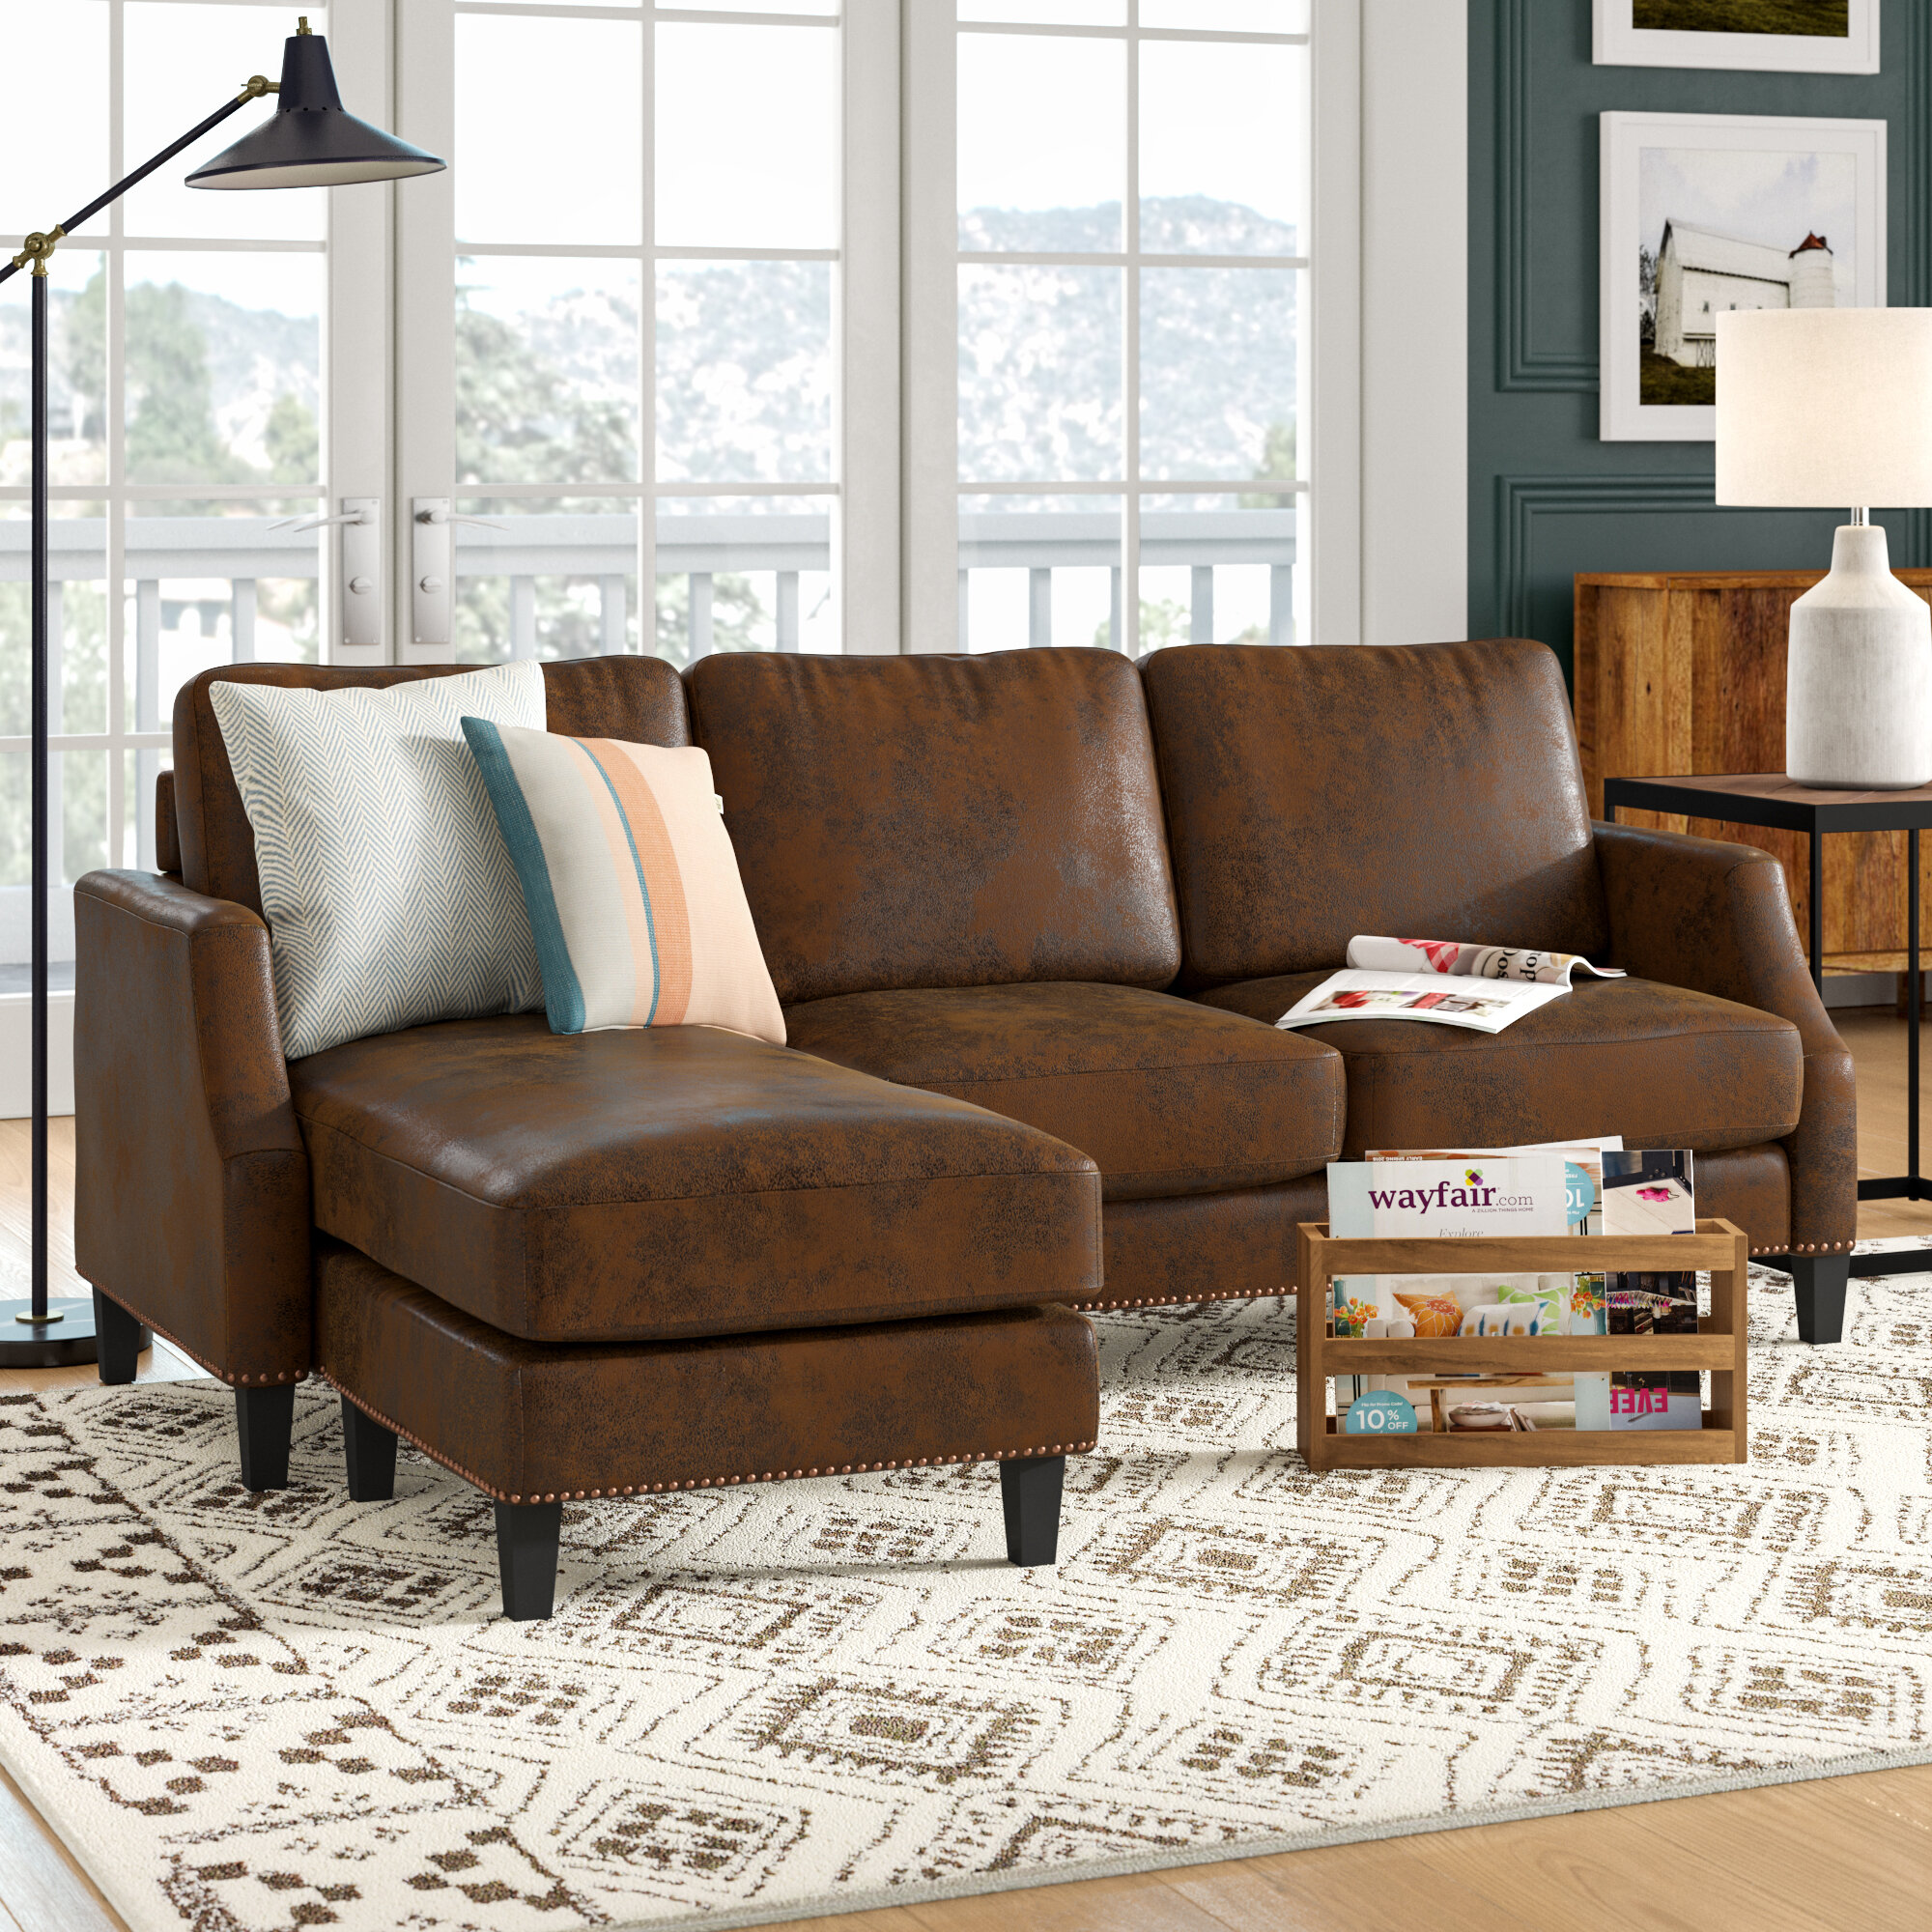 "Laurel Foundry Modern Farmhouse Edenburg 8"" Wide Reversible Sofa"